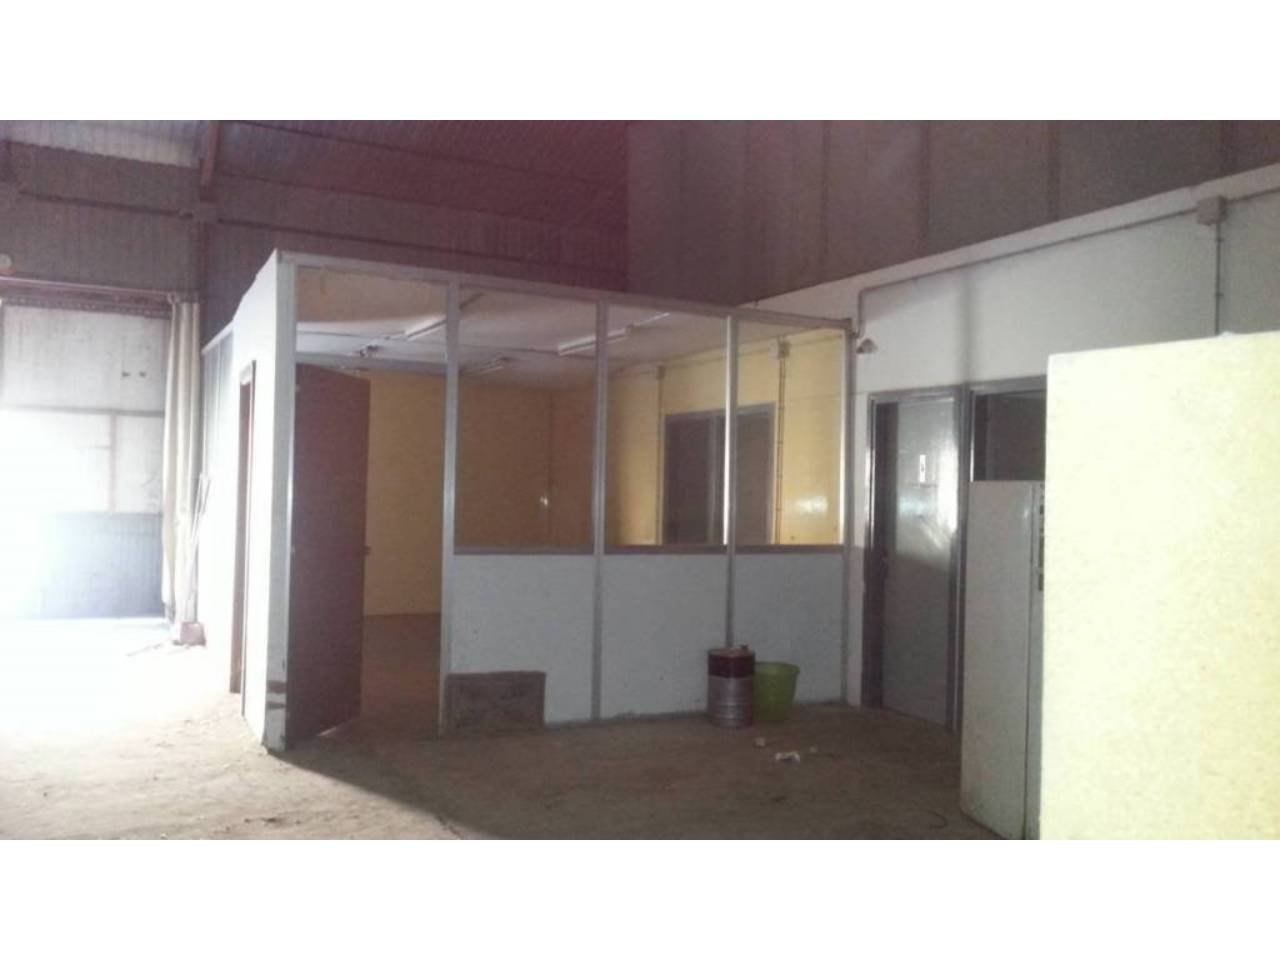 Lloguer Nau industrial  Poligono industrial. Superf. 1060 m², 1060 m² solar,  2 aseos, alcantarillado, asfalt